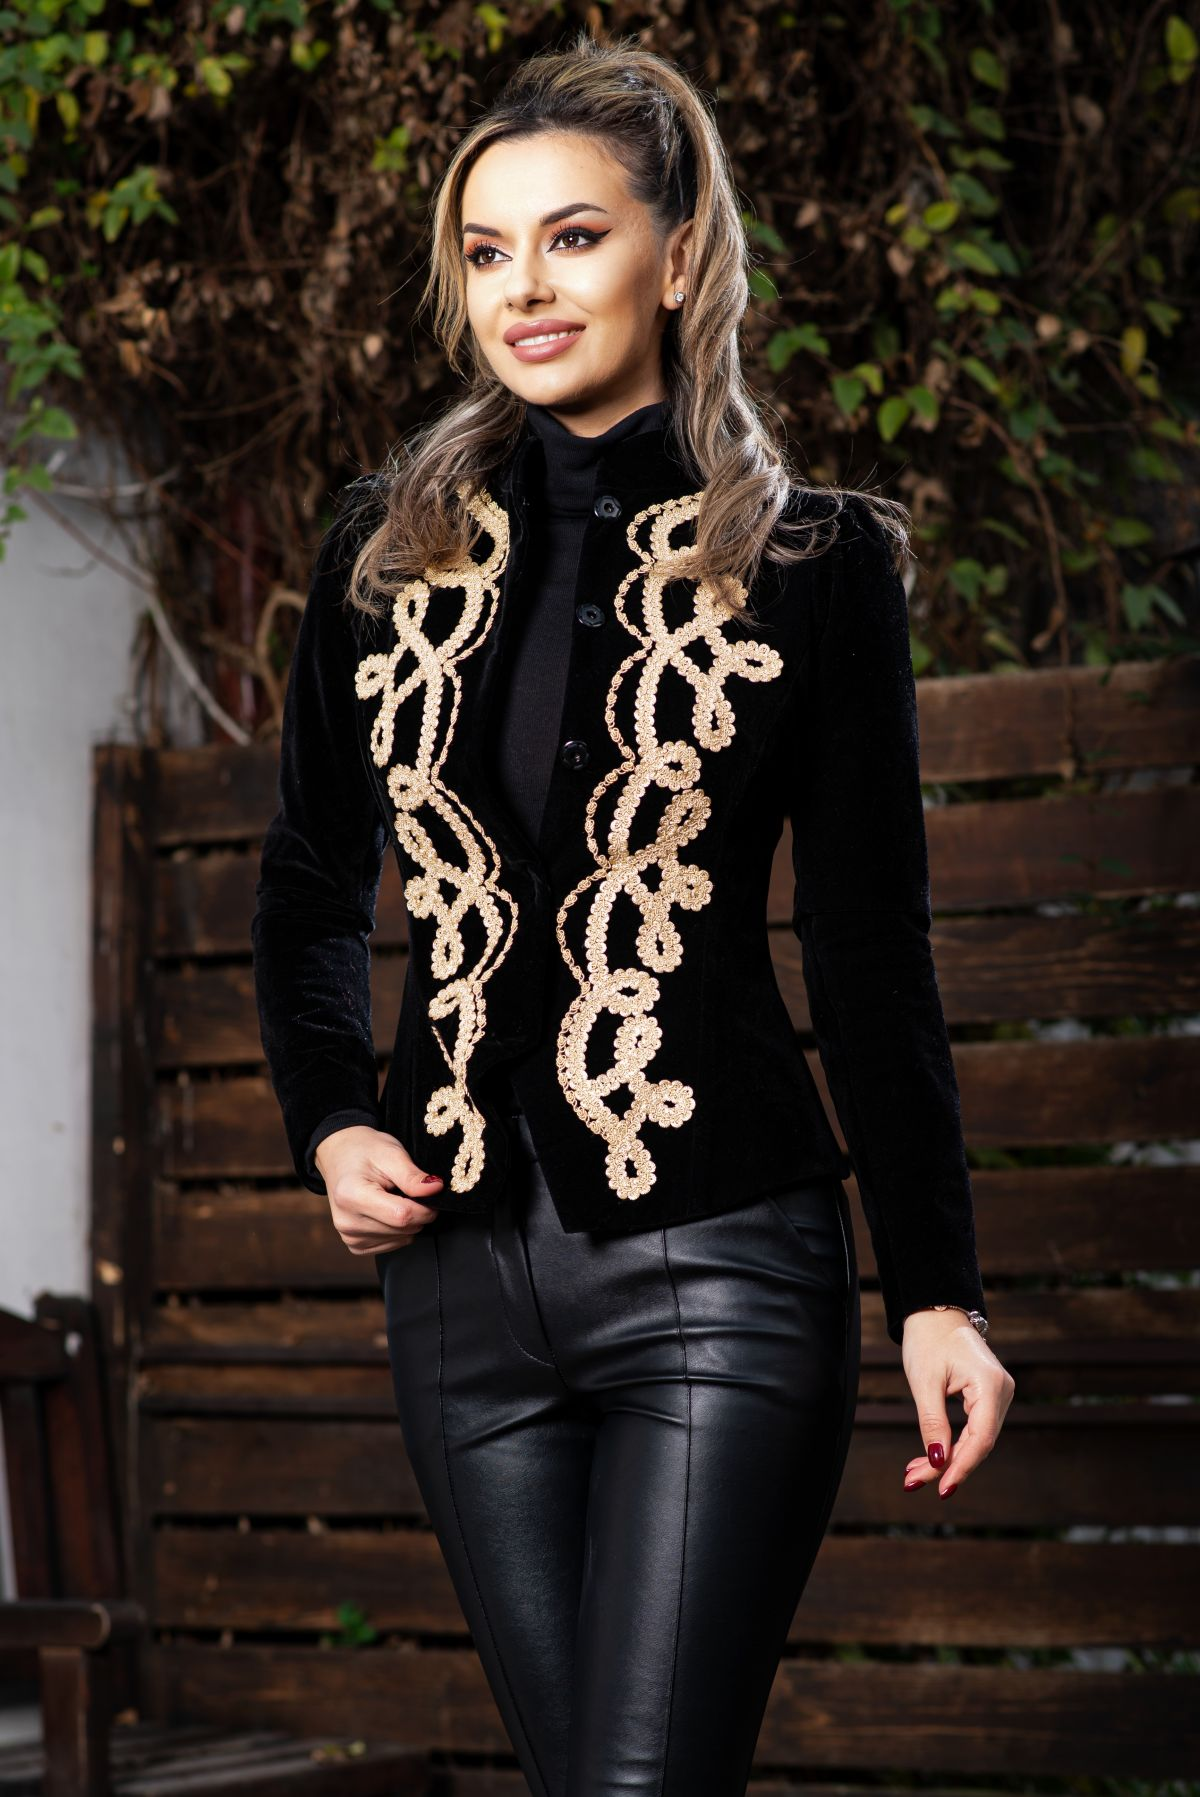 Jacheta eleganta dama din catifea neagra accesorizata cu broderie aurie